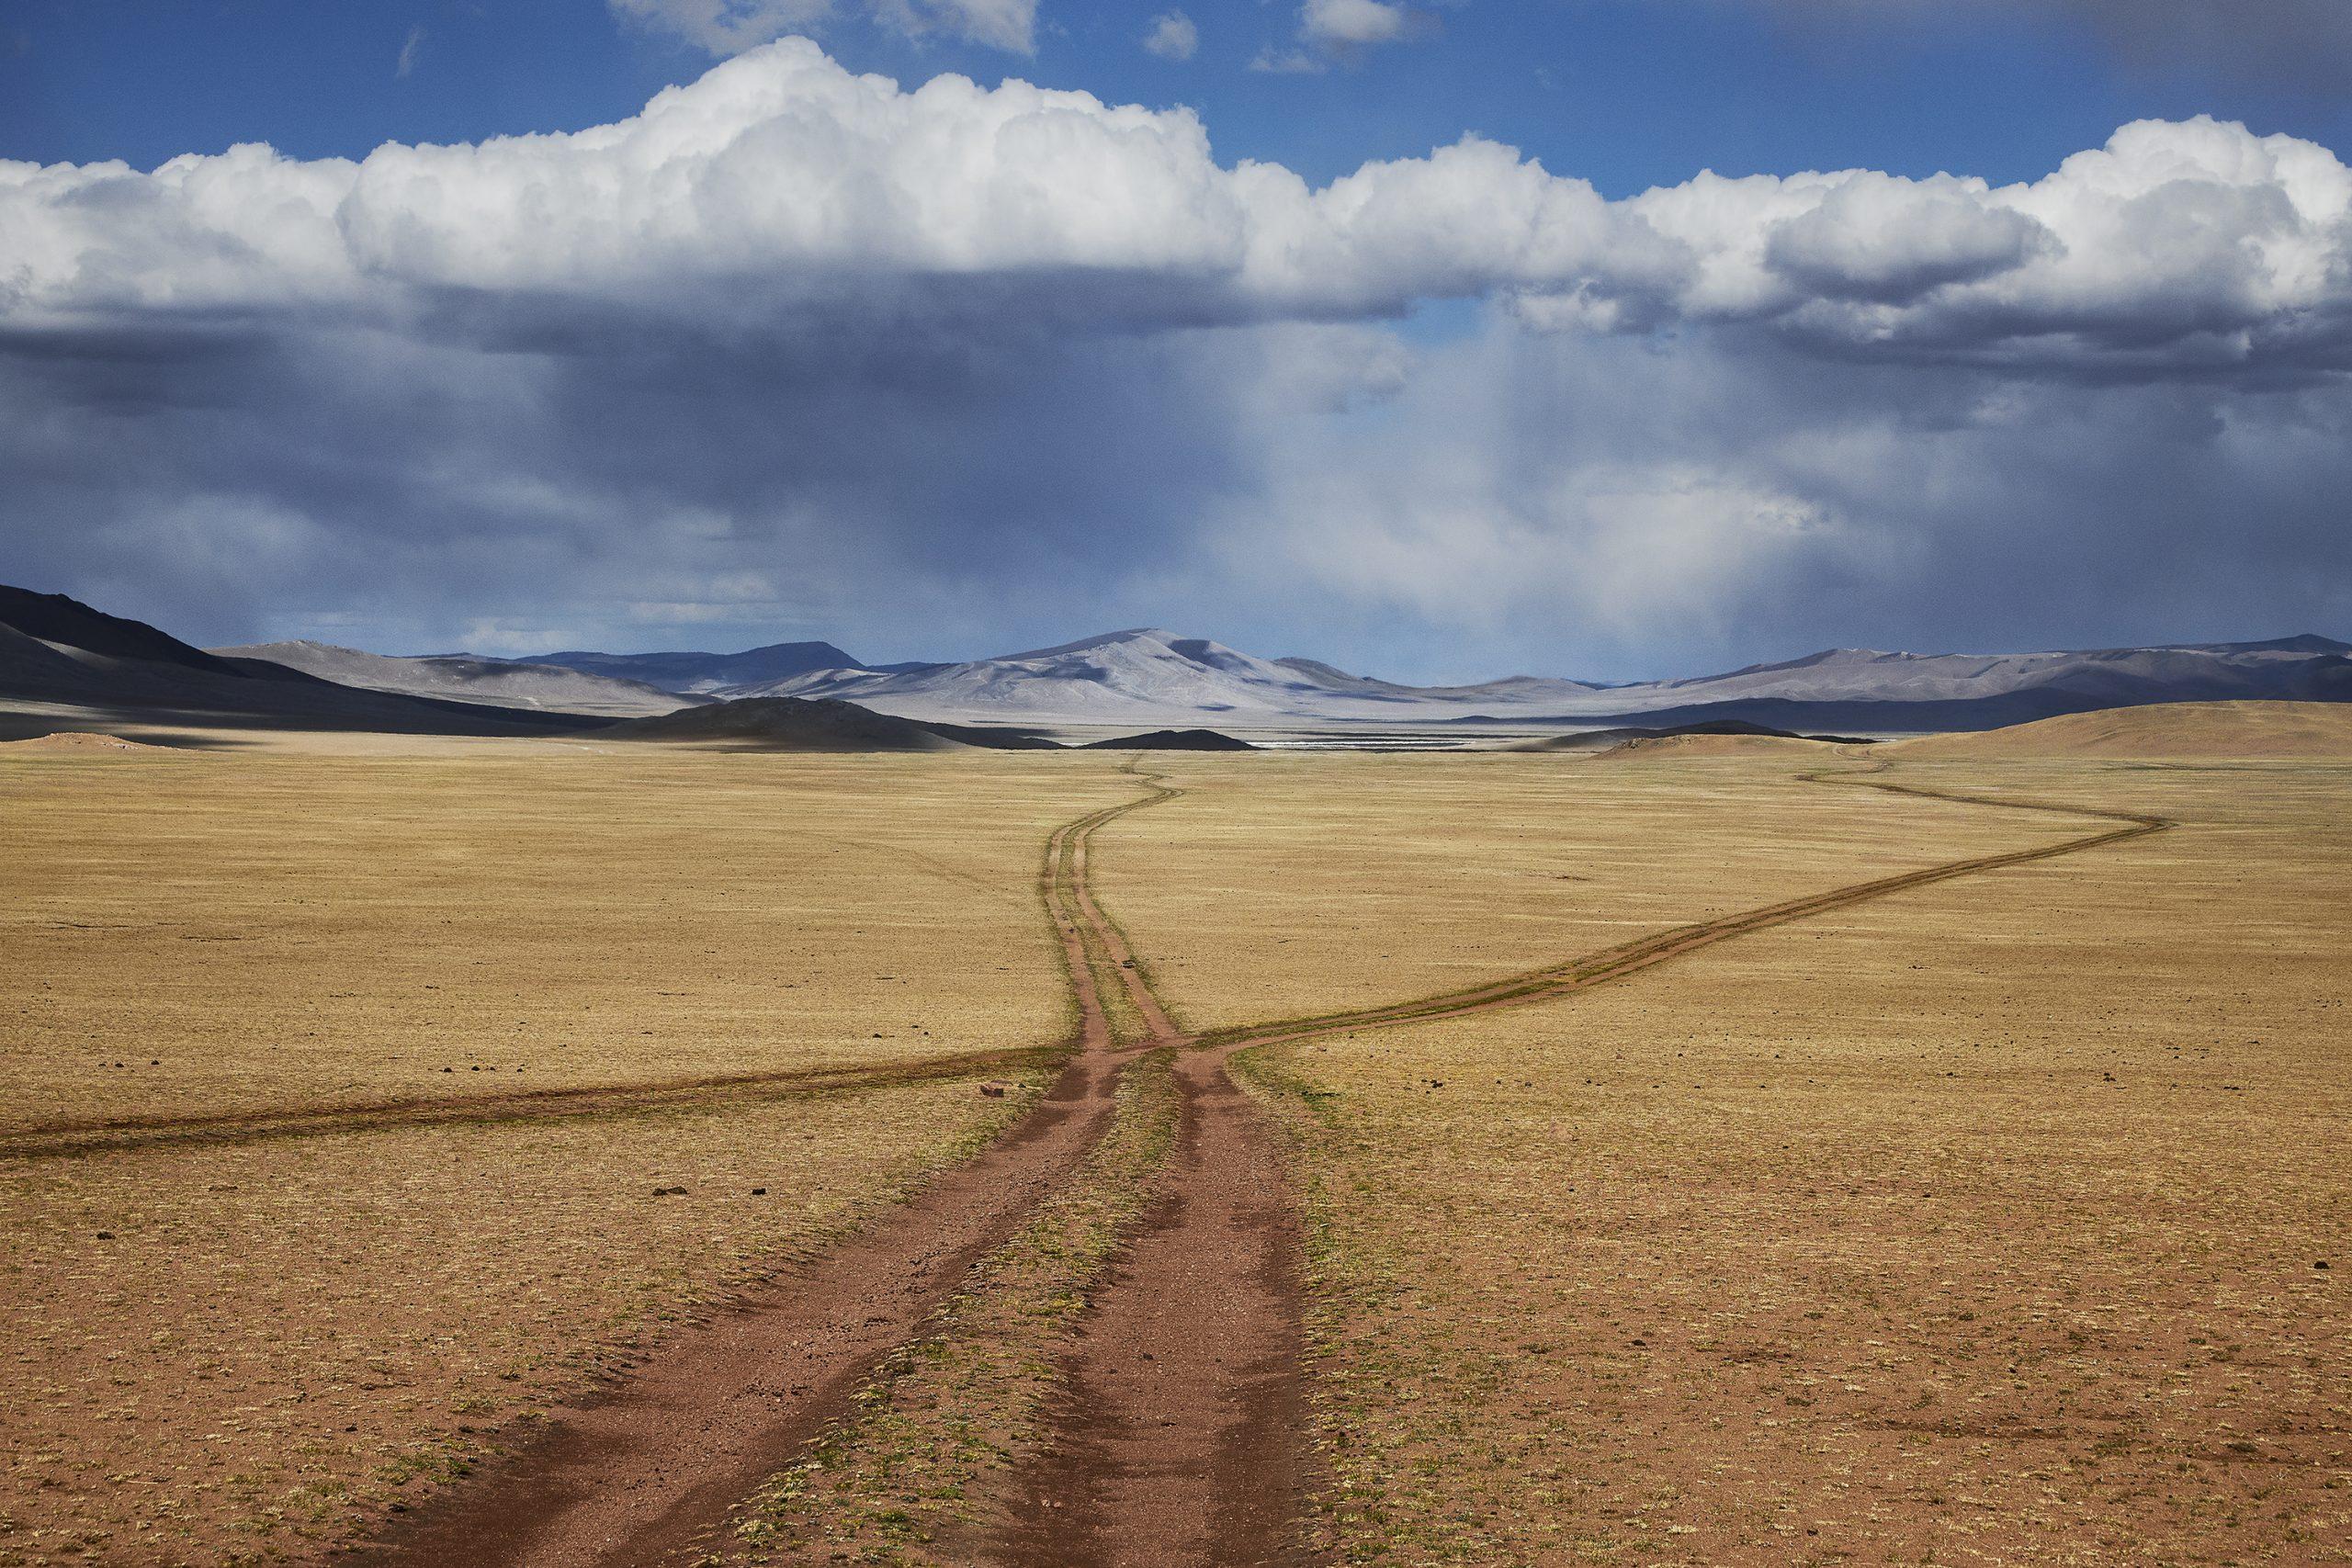 Steve McCurry, Mongolia, landscape, fields, mountains, sky